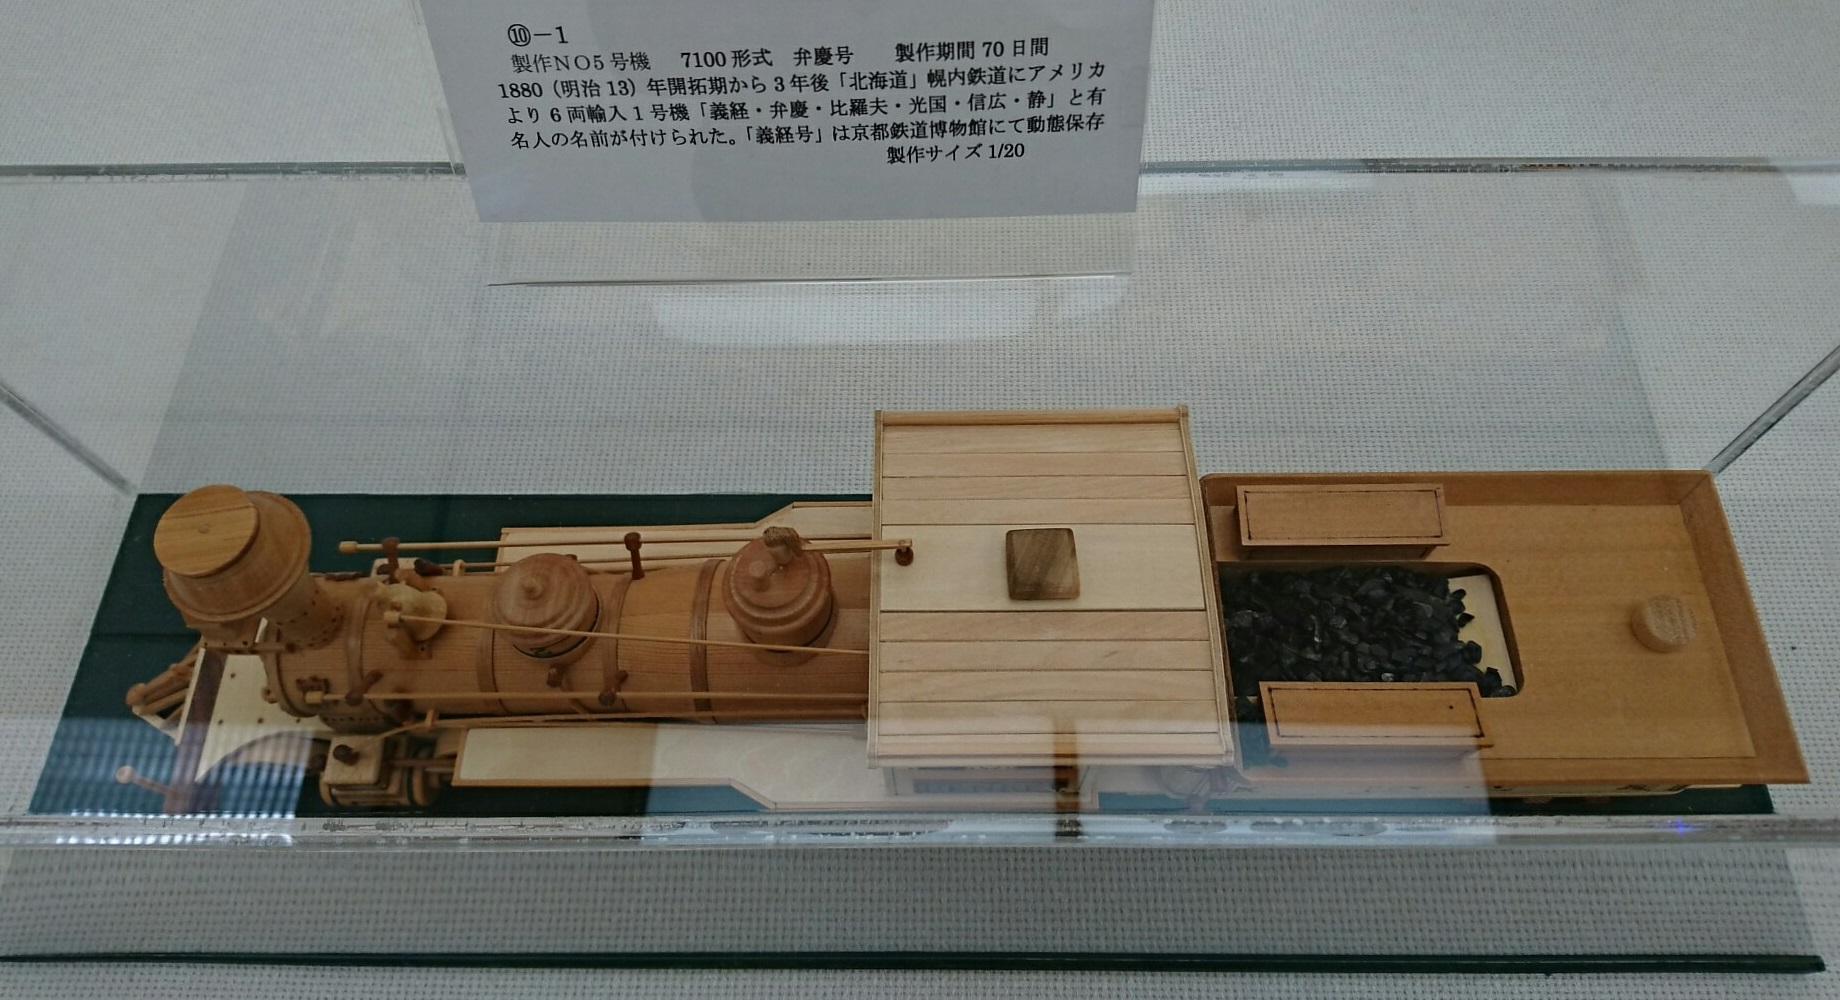 2018.3.21 木工細工蒸気機関車展 (5) 弁慶号 - 説明がき 1840-1000